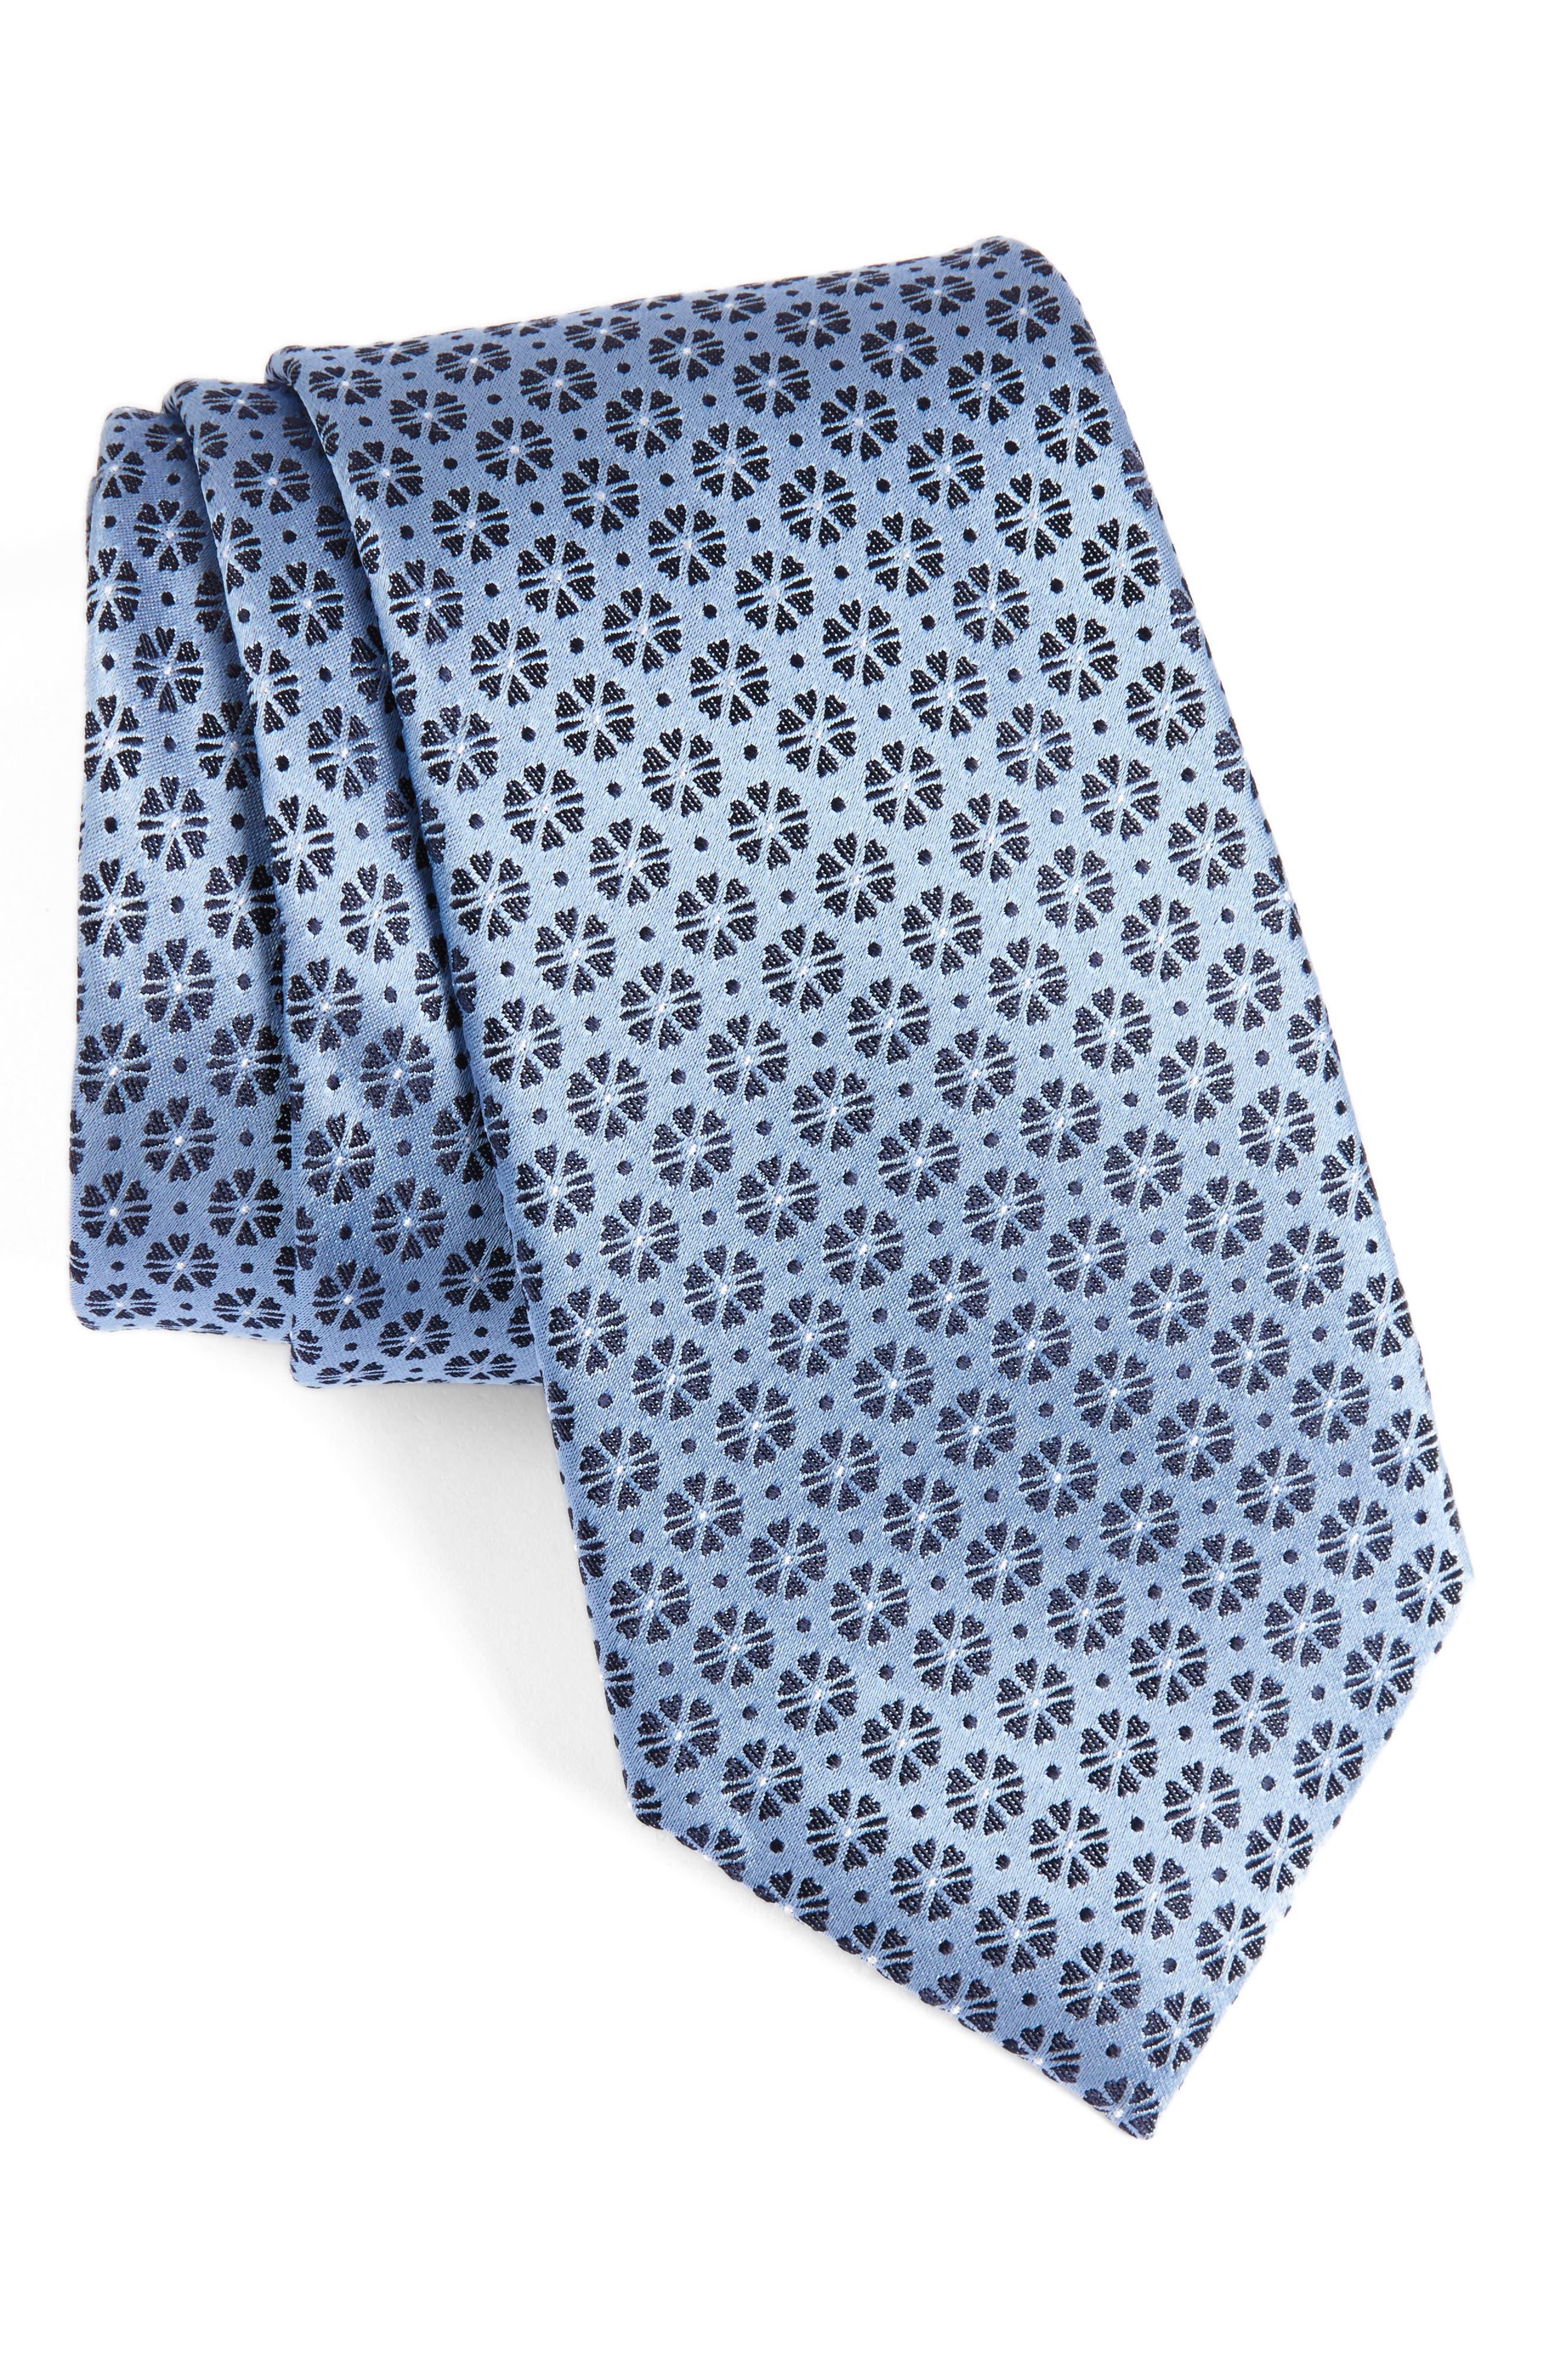 CALIBRATE Clover Medallion Silk Tie